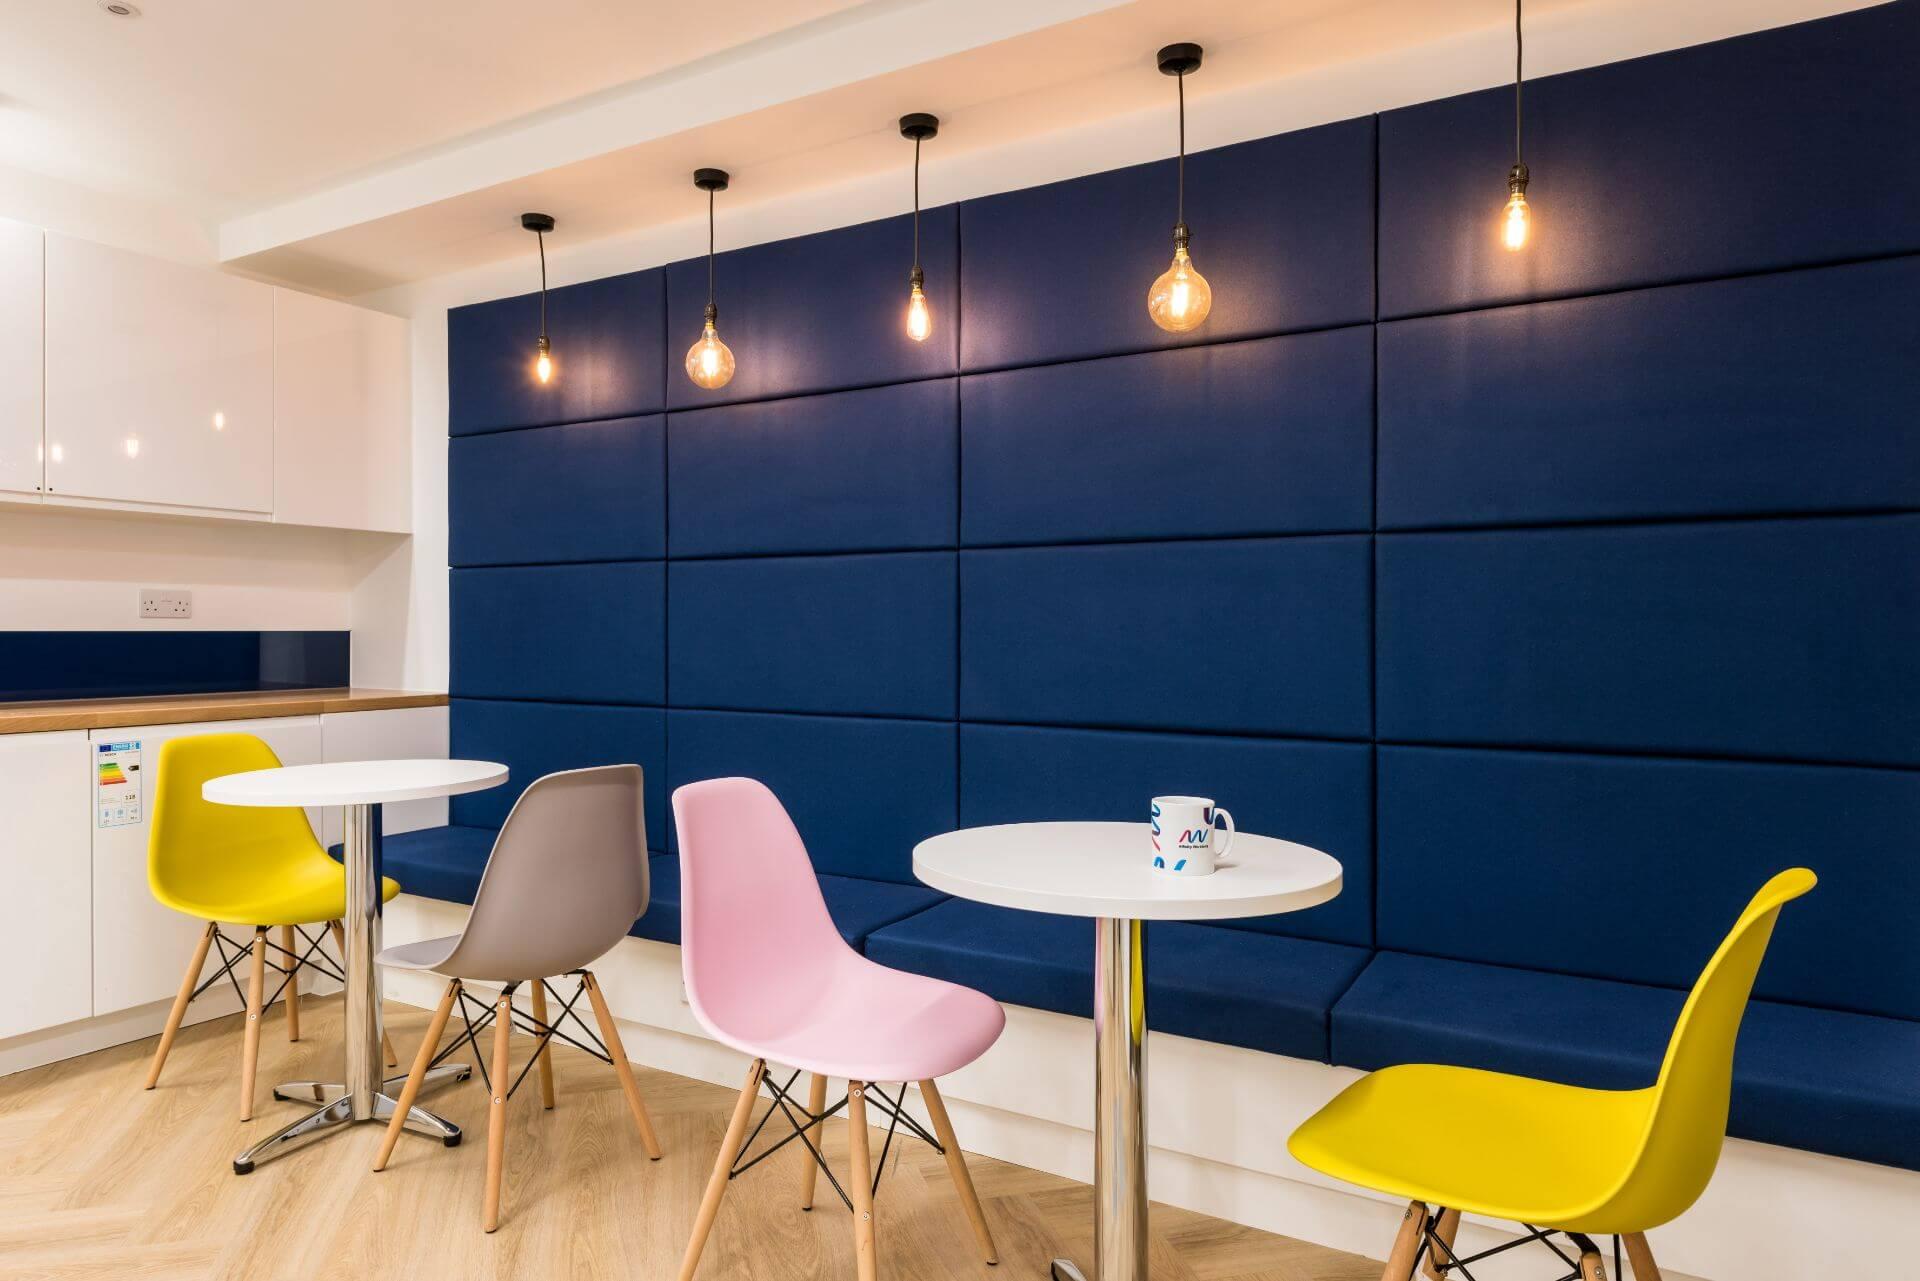 Affinity Workforce Dining Room